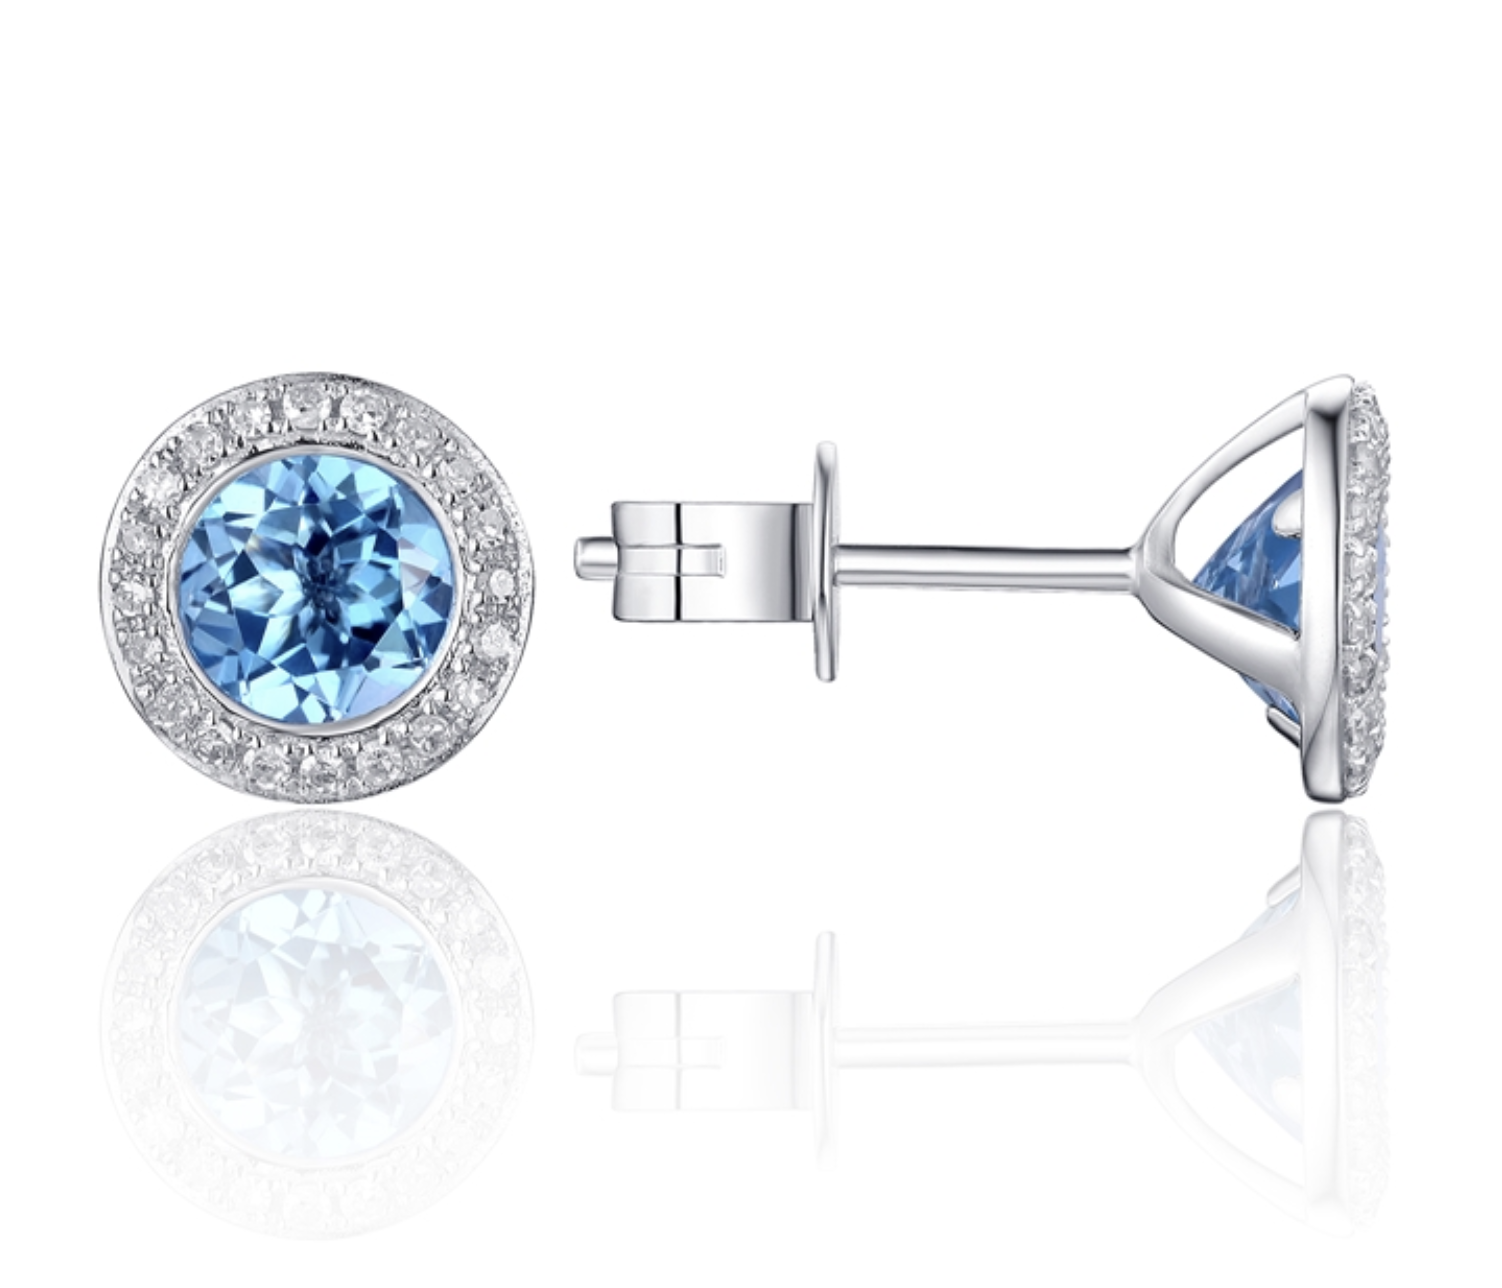 Luvente White Gold Diamond Pave & Blue Topaz Earrings